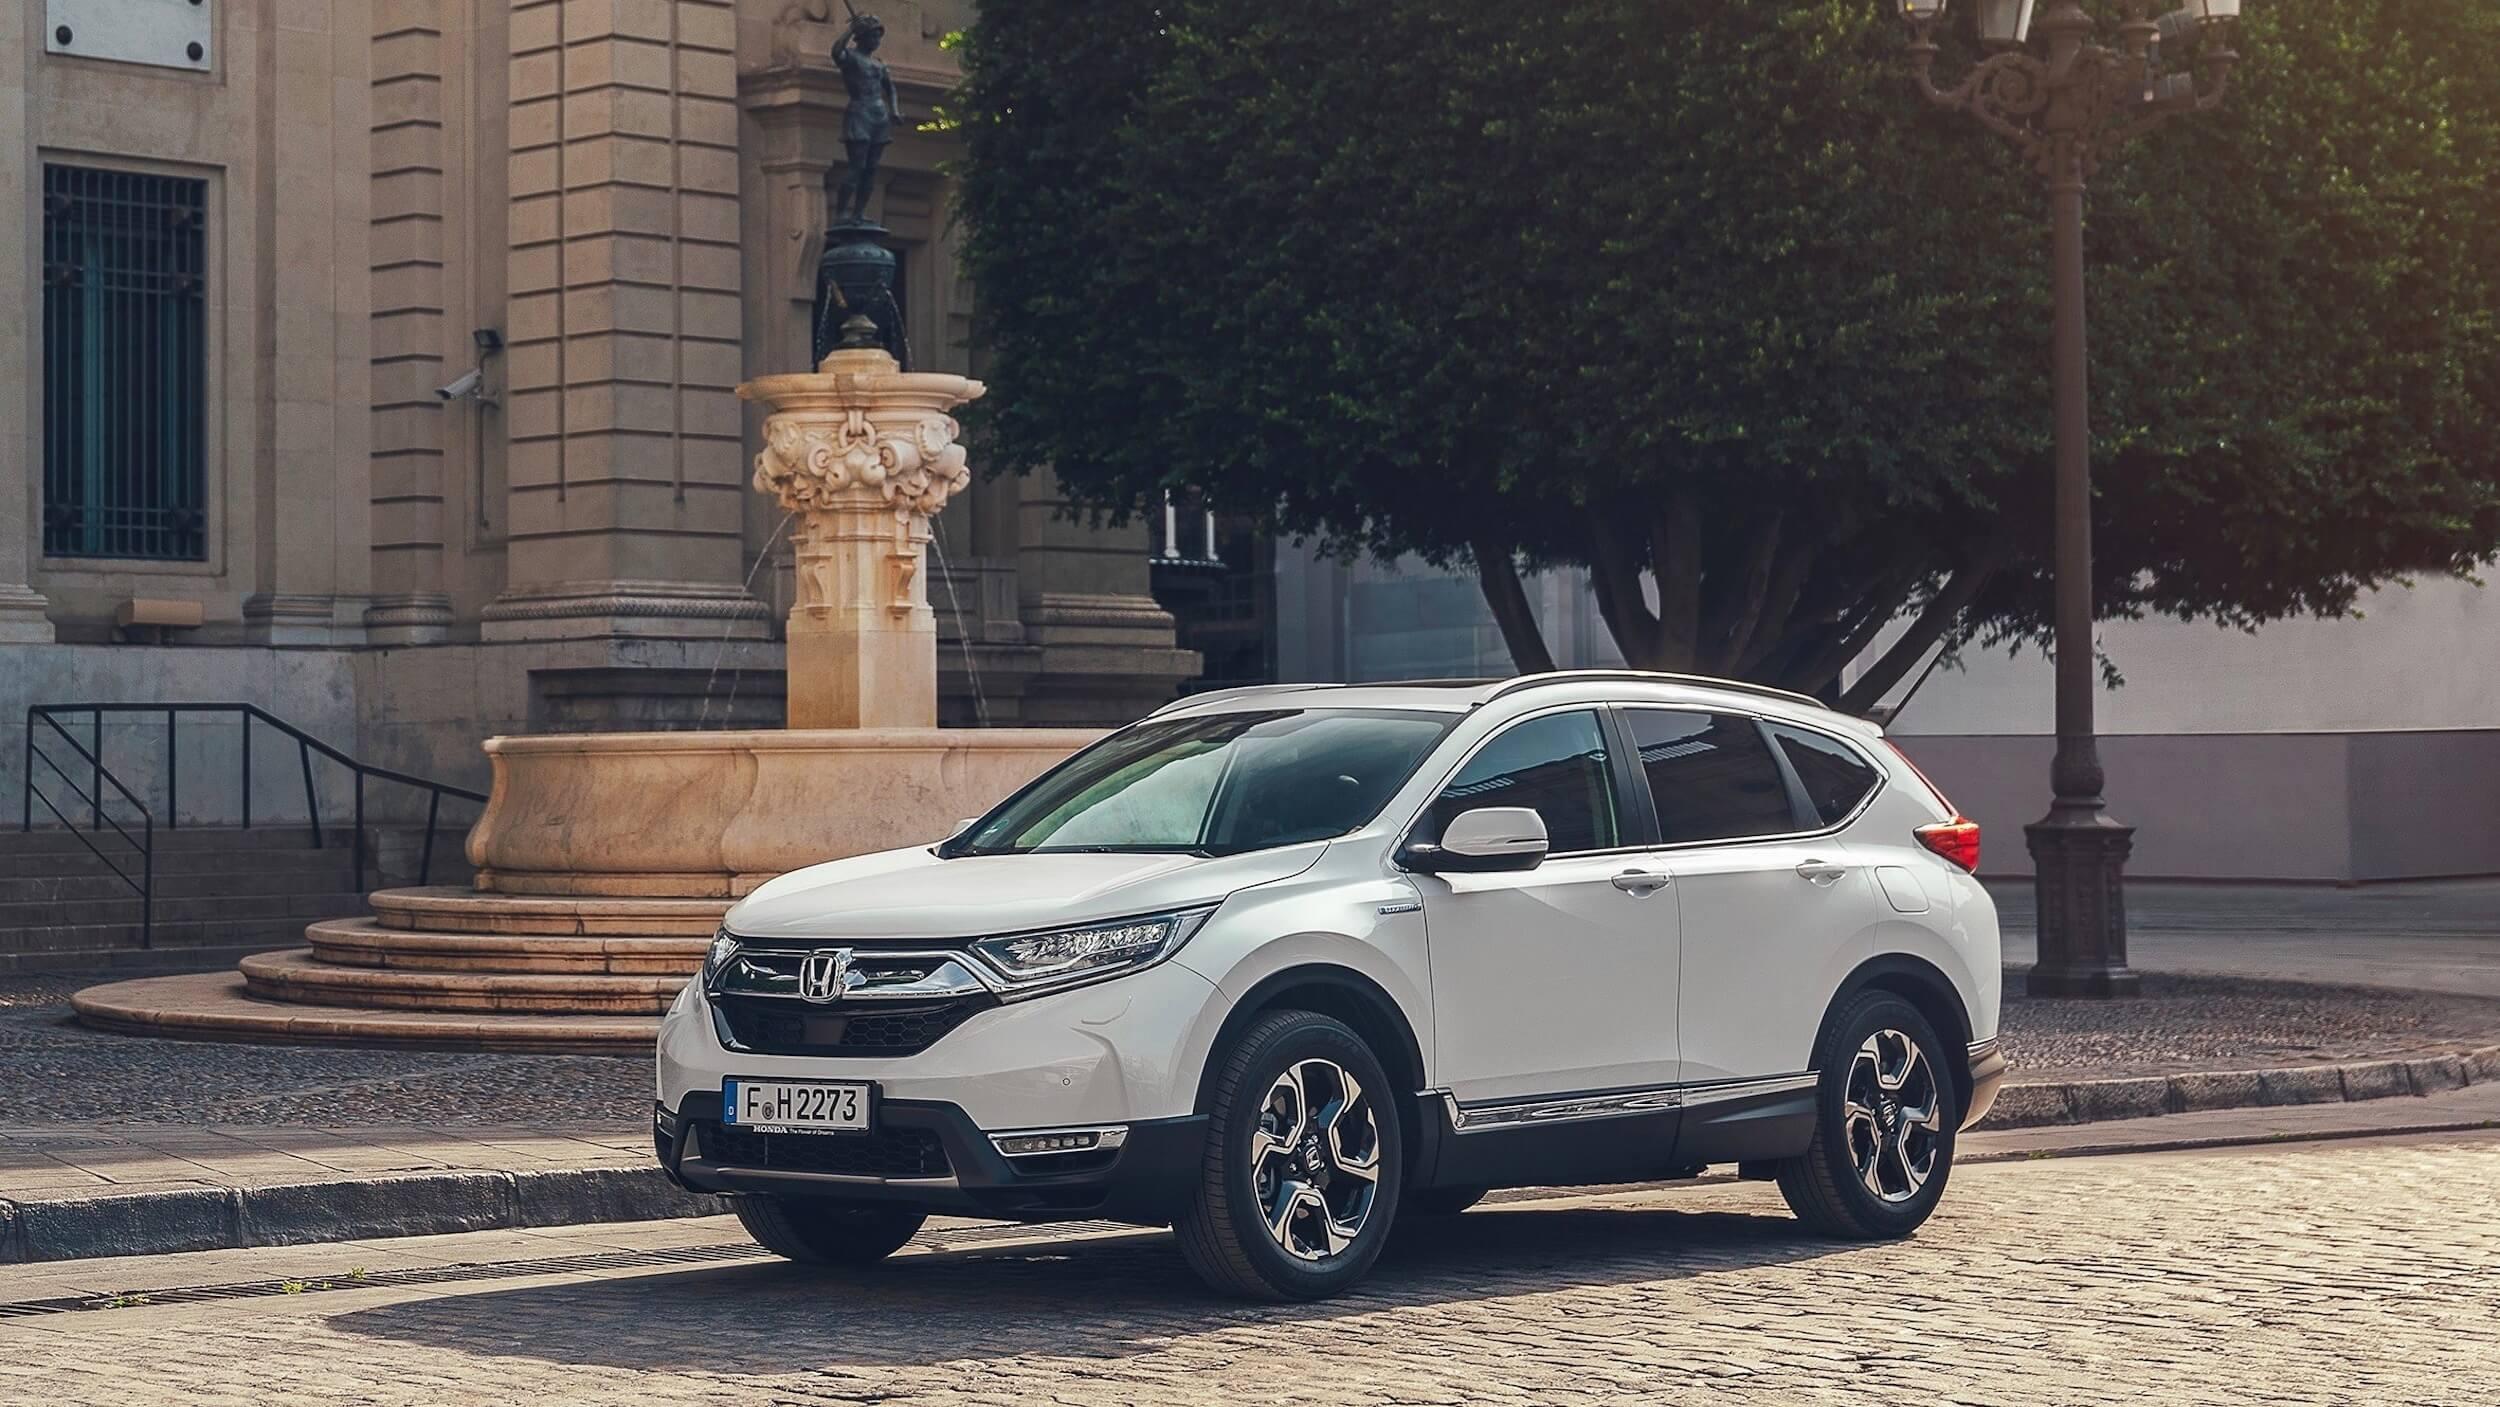 Honda suv híbrido